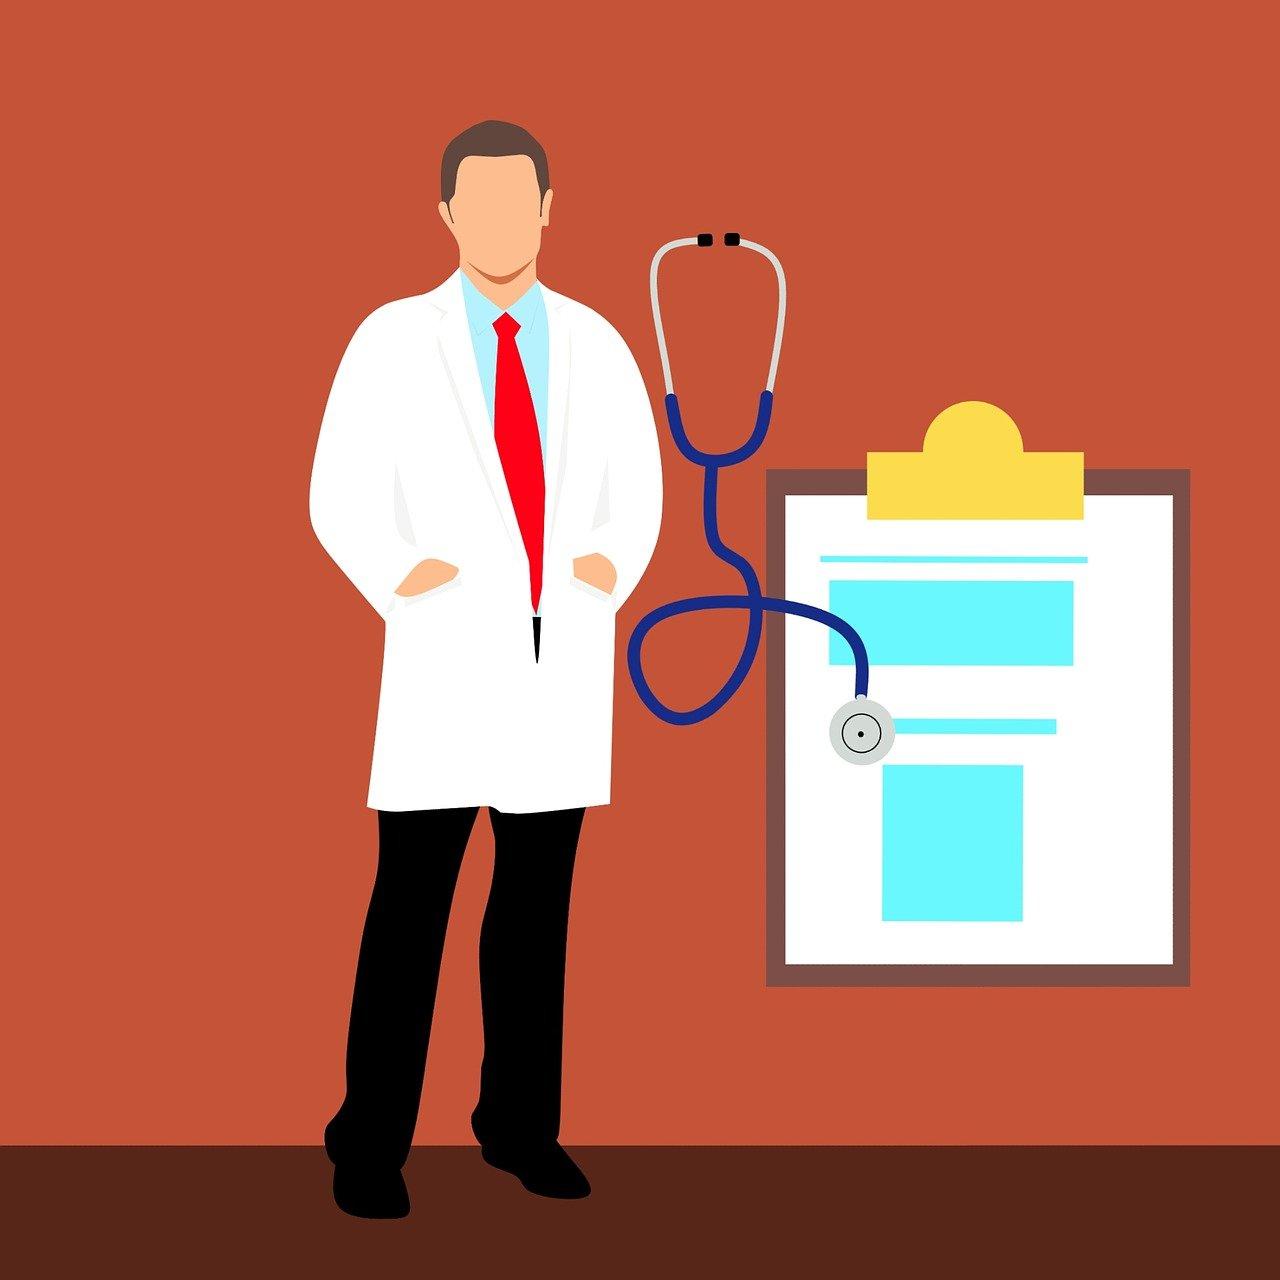 St1 Medical arts opleiding